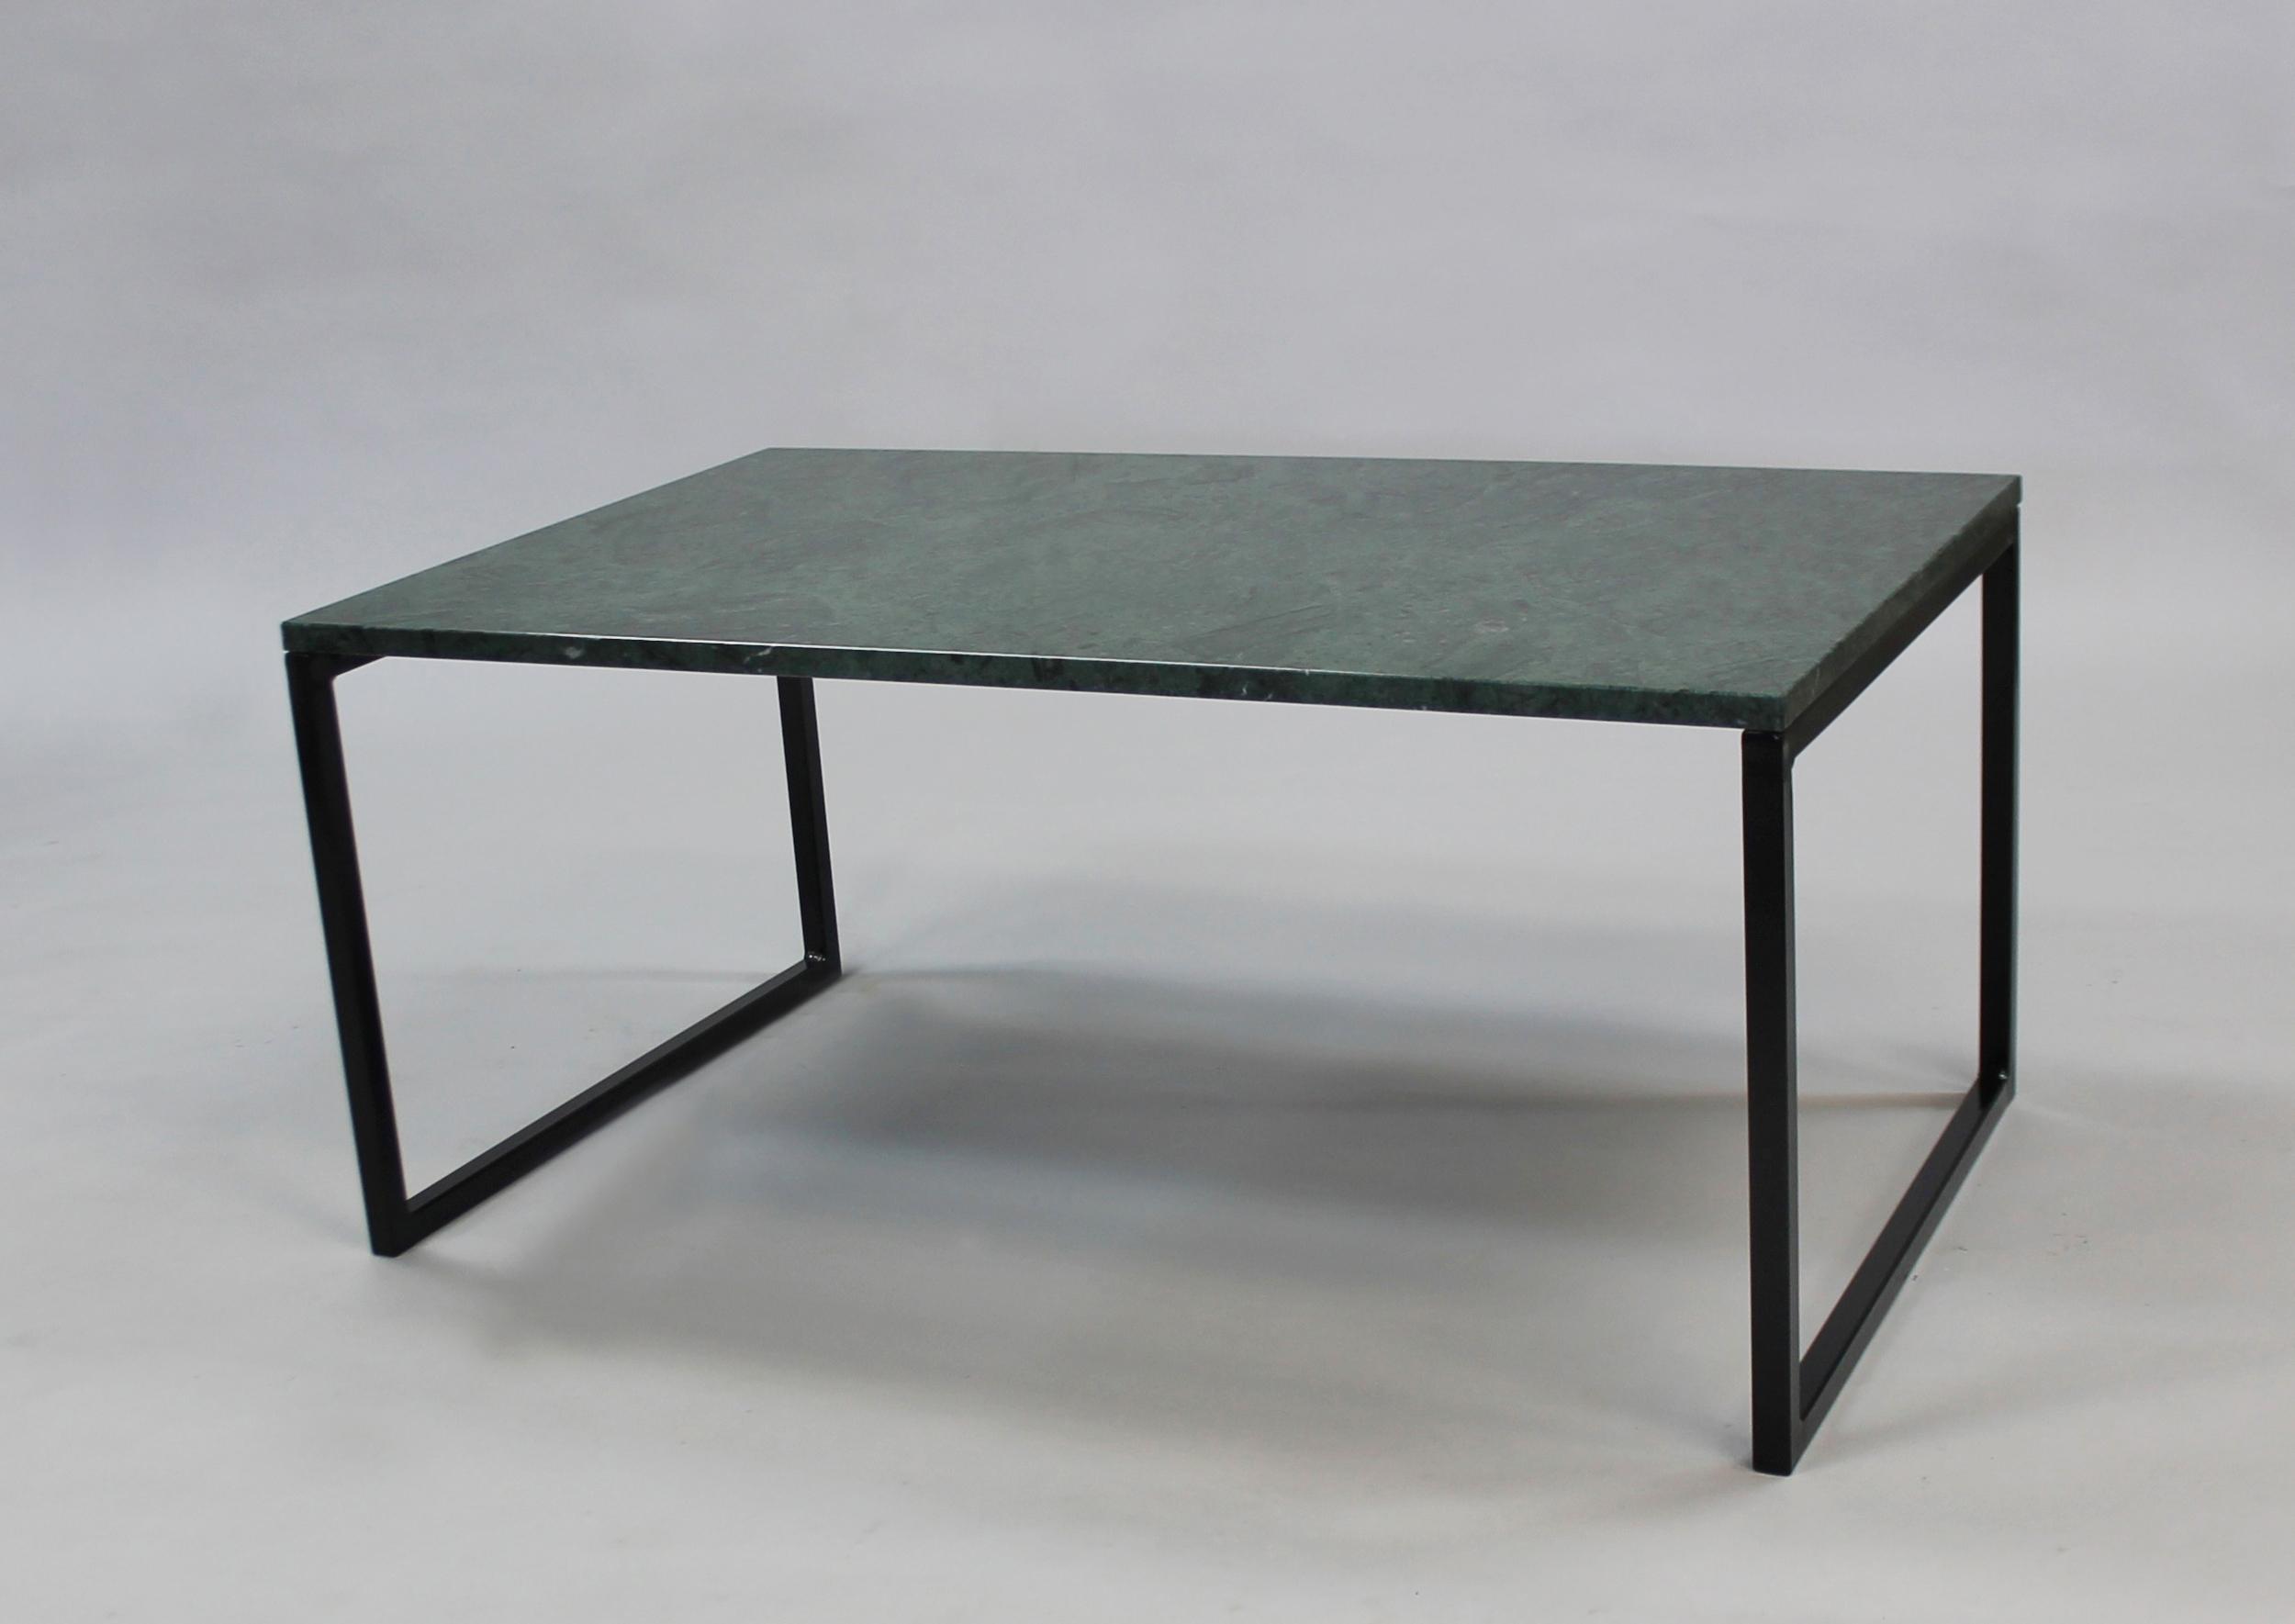 Marmorbord, grön  - 100x60 x  45  cm, svart underrede svävande  Pris 6 000 :-  inkl frakt  Pris nu 4000:- inkl frakt    Finns även i 120x60 cm -   pris 7 000:- inkl frakt   Pris nu 4500:- inkl frakt